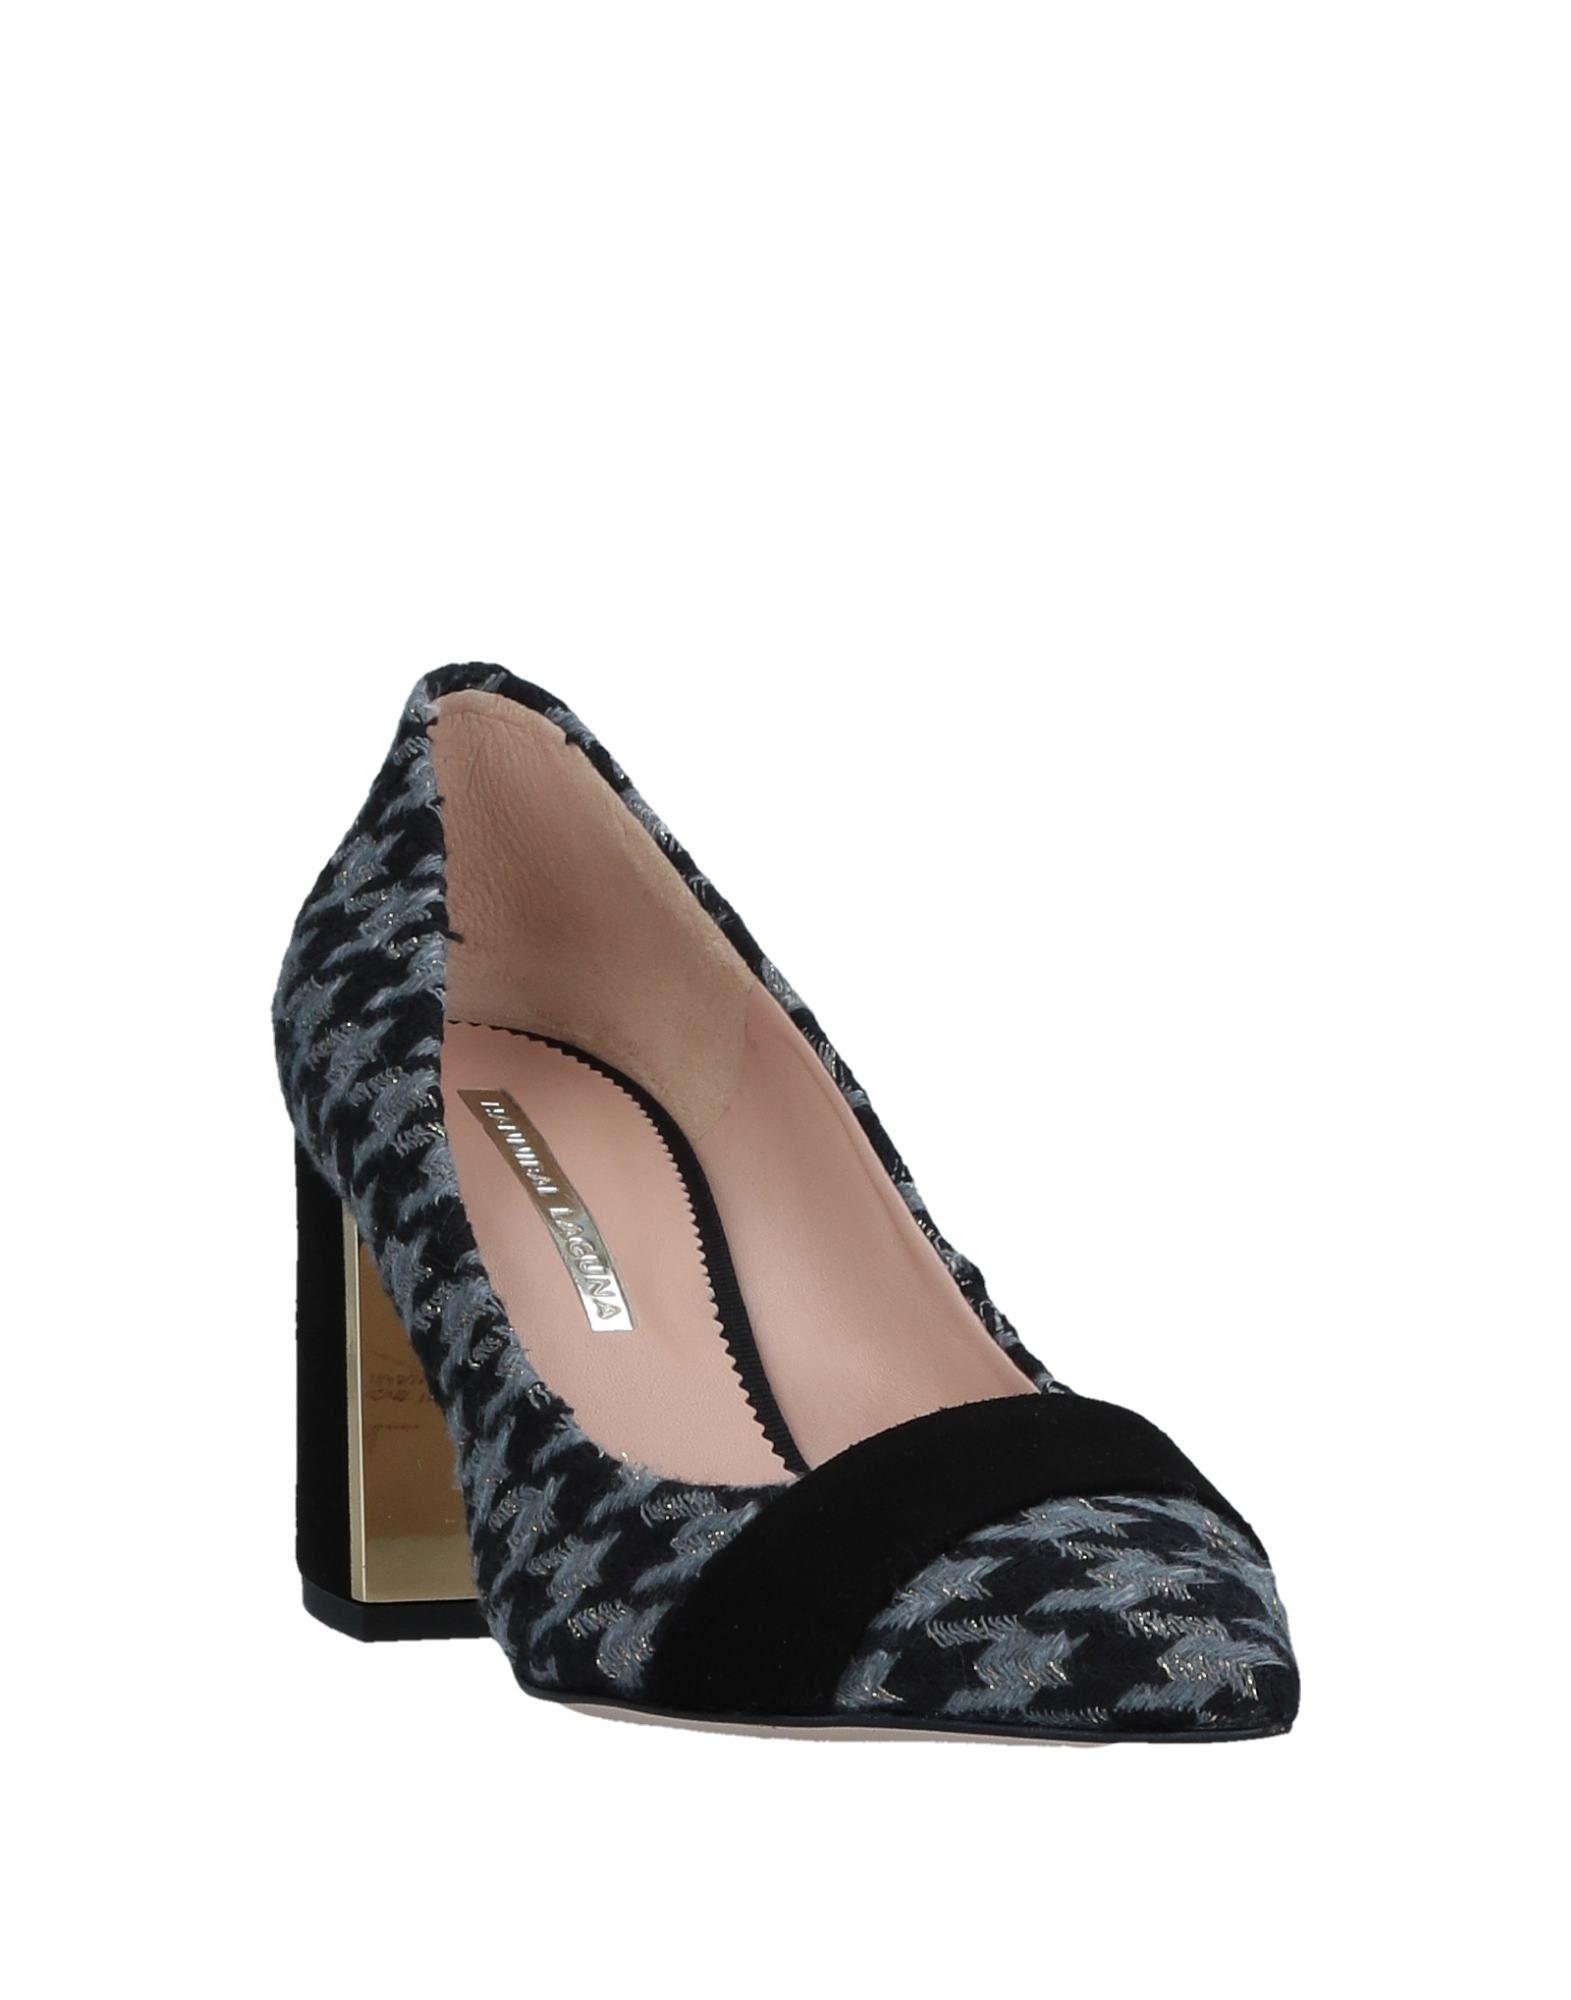 Hannibal Laguna Pumps Damen  11533681PO Gute Qualität beliebte beliebte beliebte Schuhe 71f688